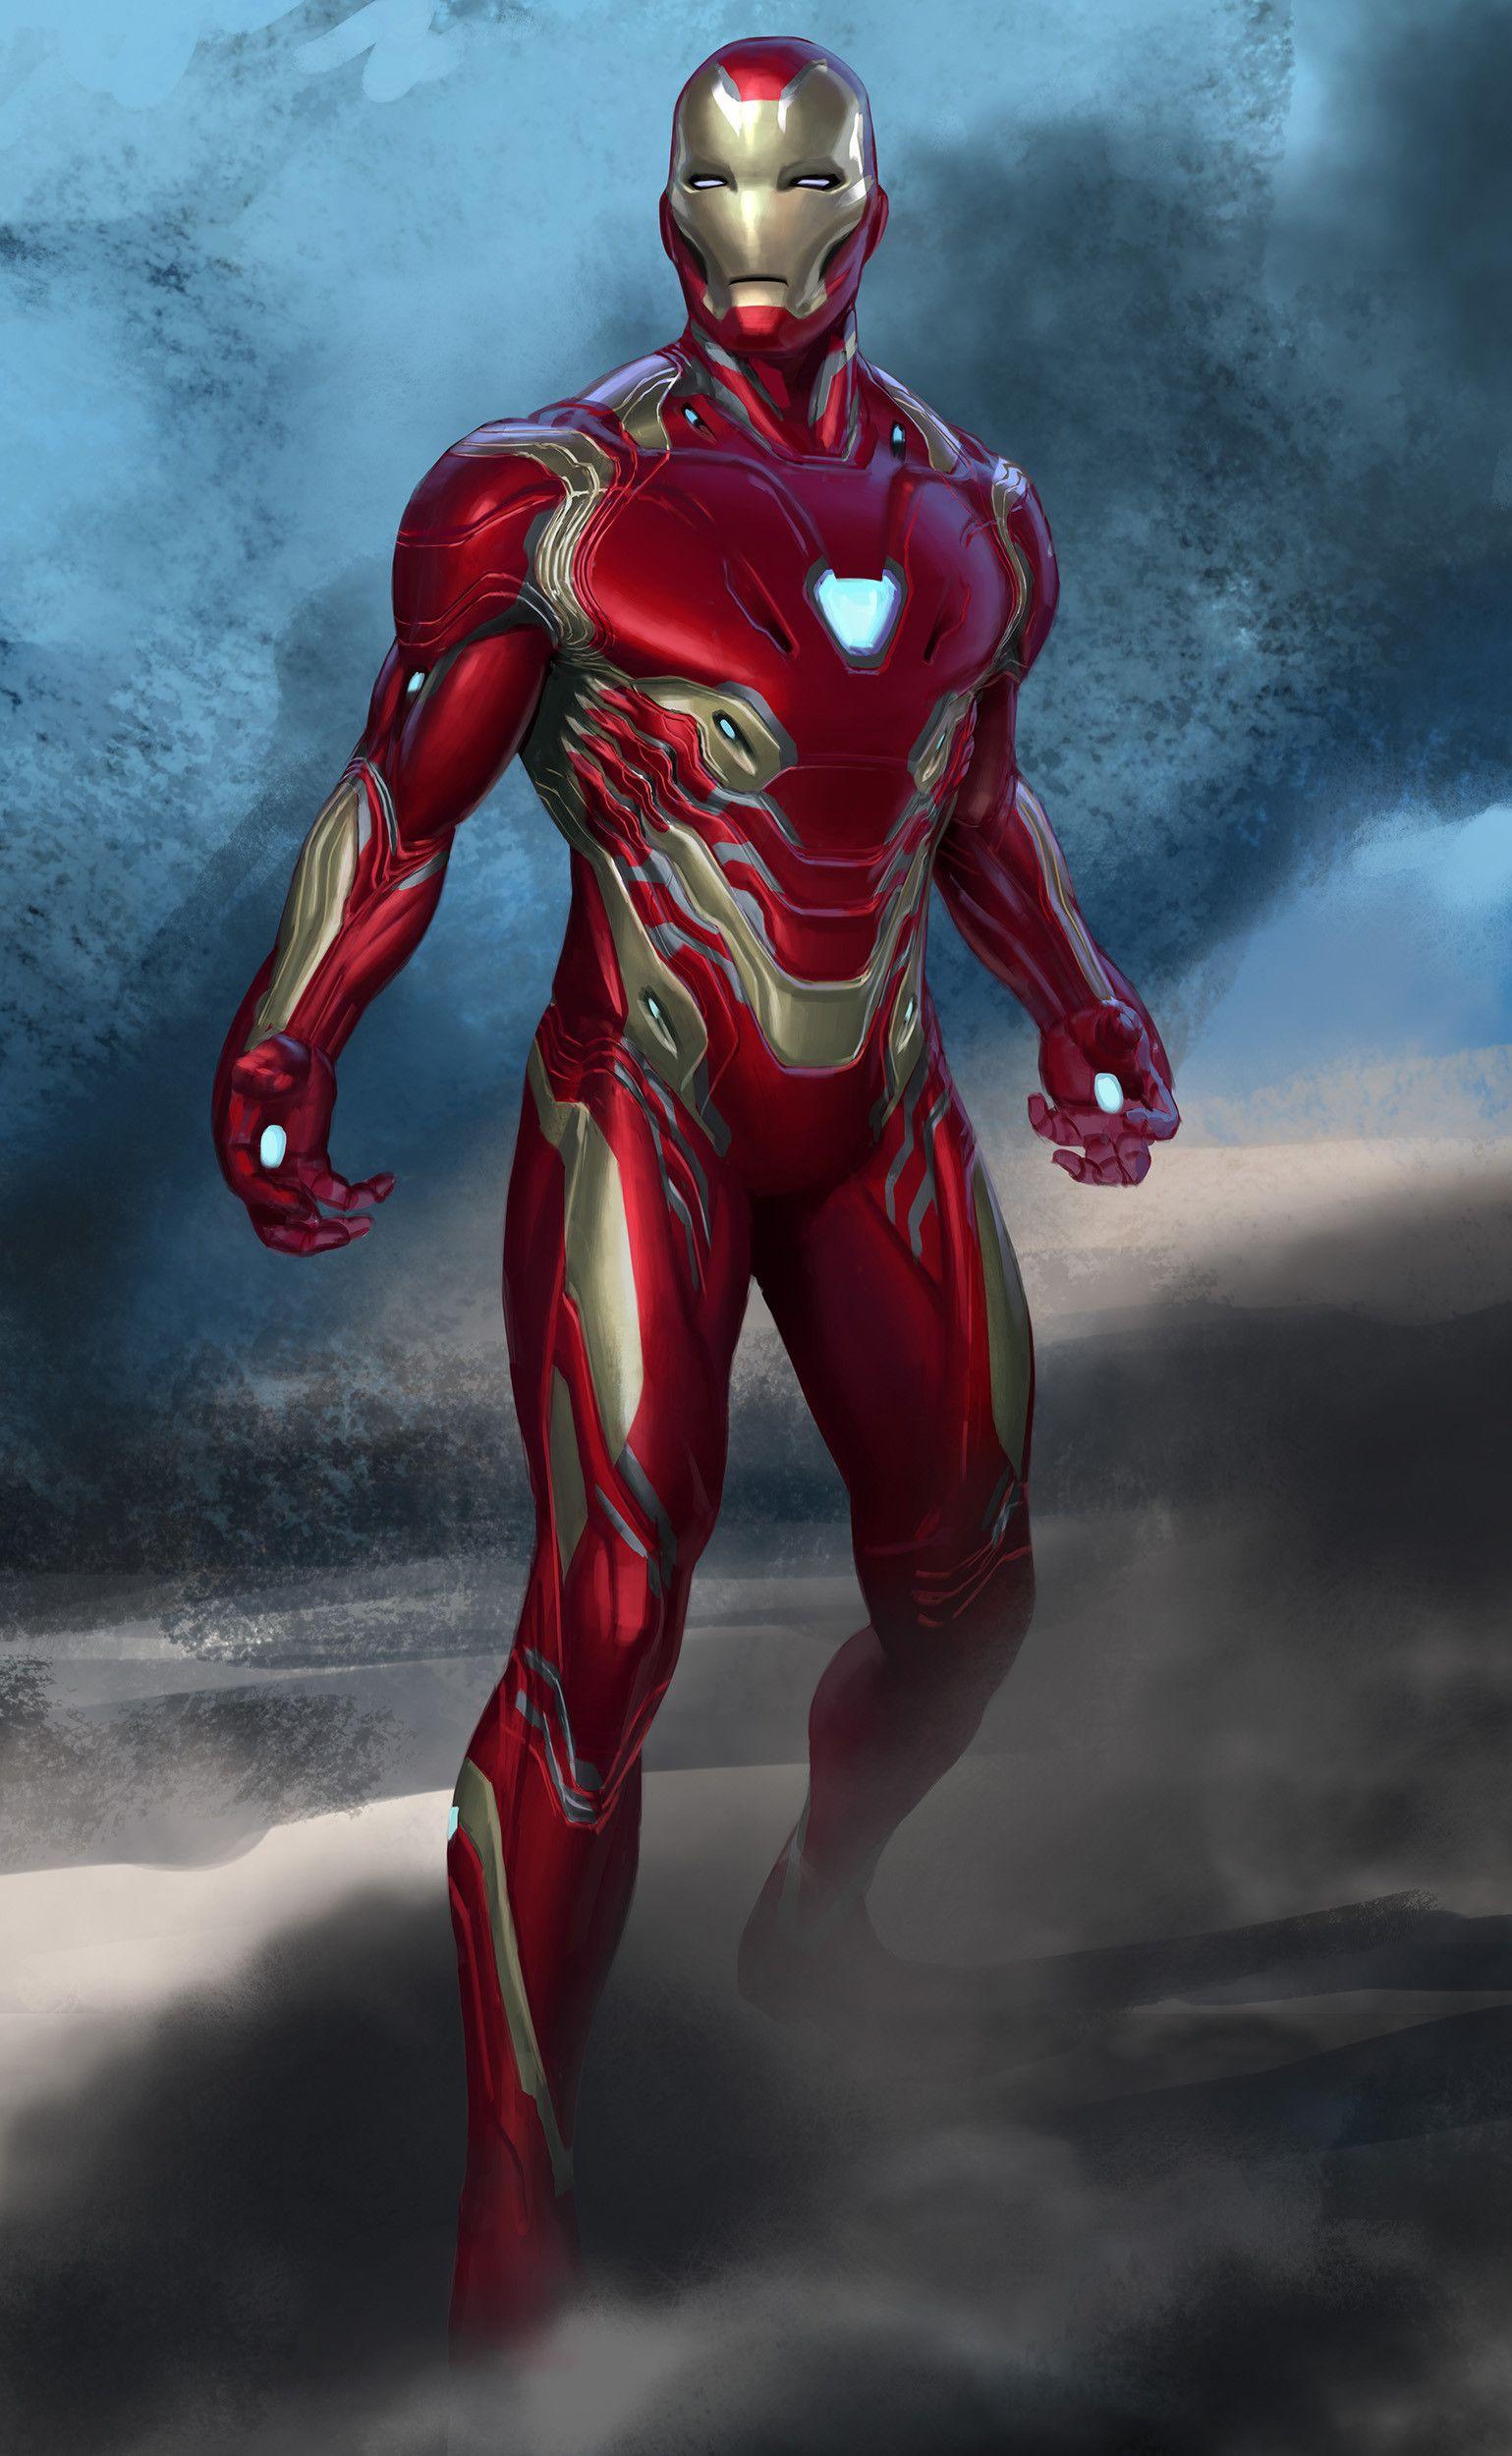 Artstation Avengers Infinity War Iron Man Mk50 Original Sketch Phil Saunders Iron Man Movie Marvel Iron Man Iron Man Art